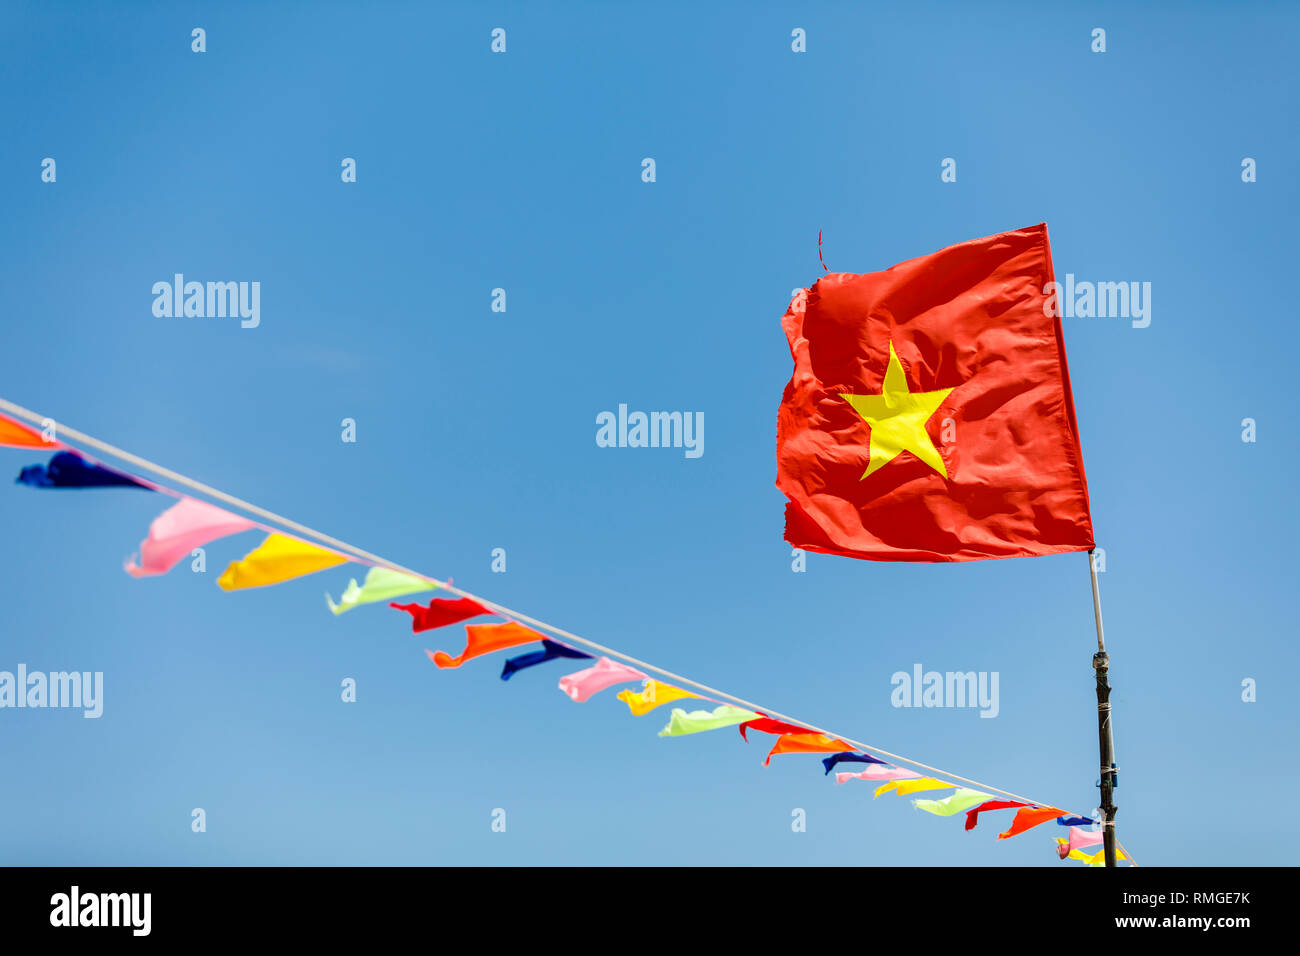 Mit fahne gelben stern rot Flagge China,